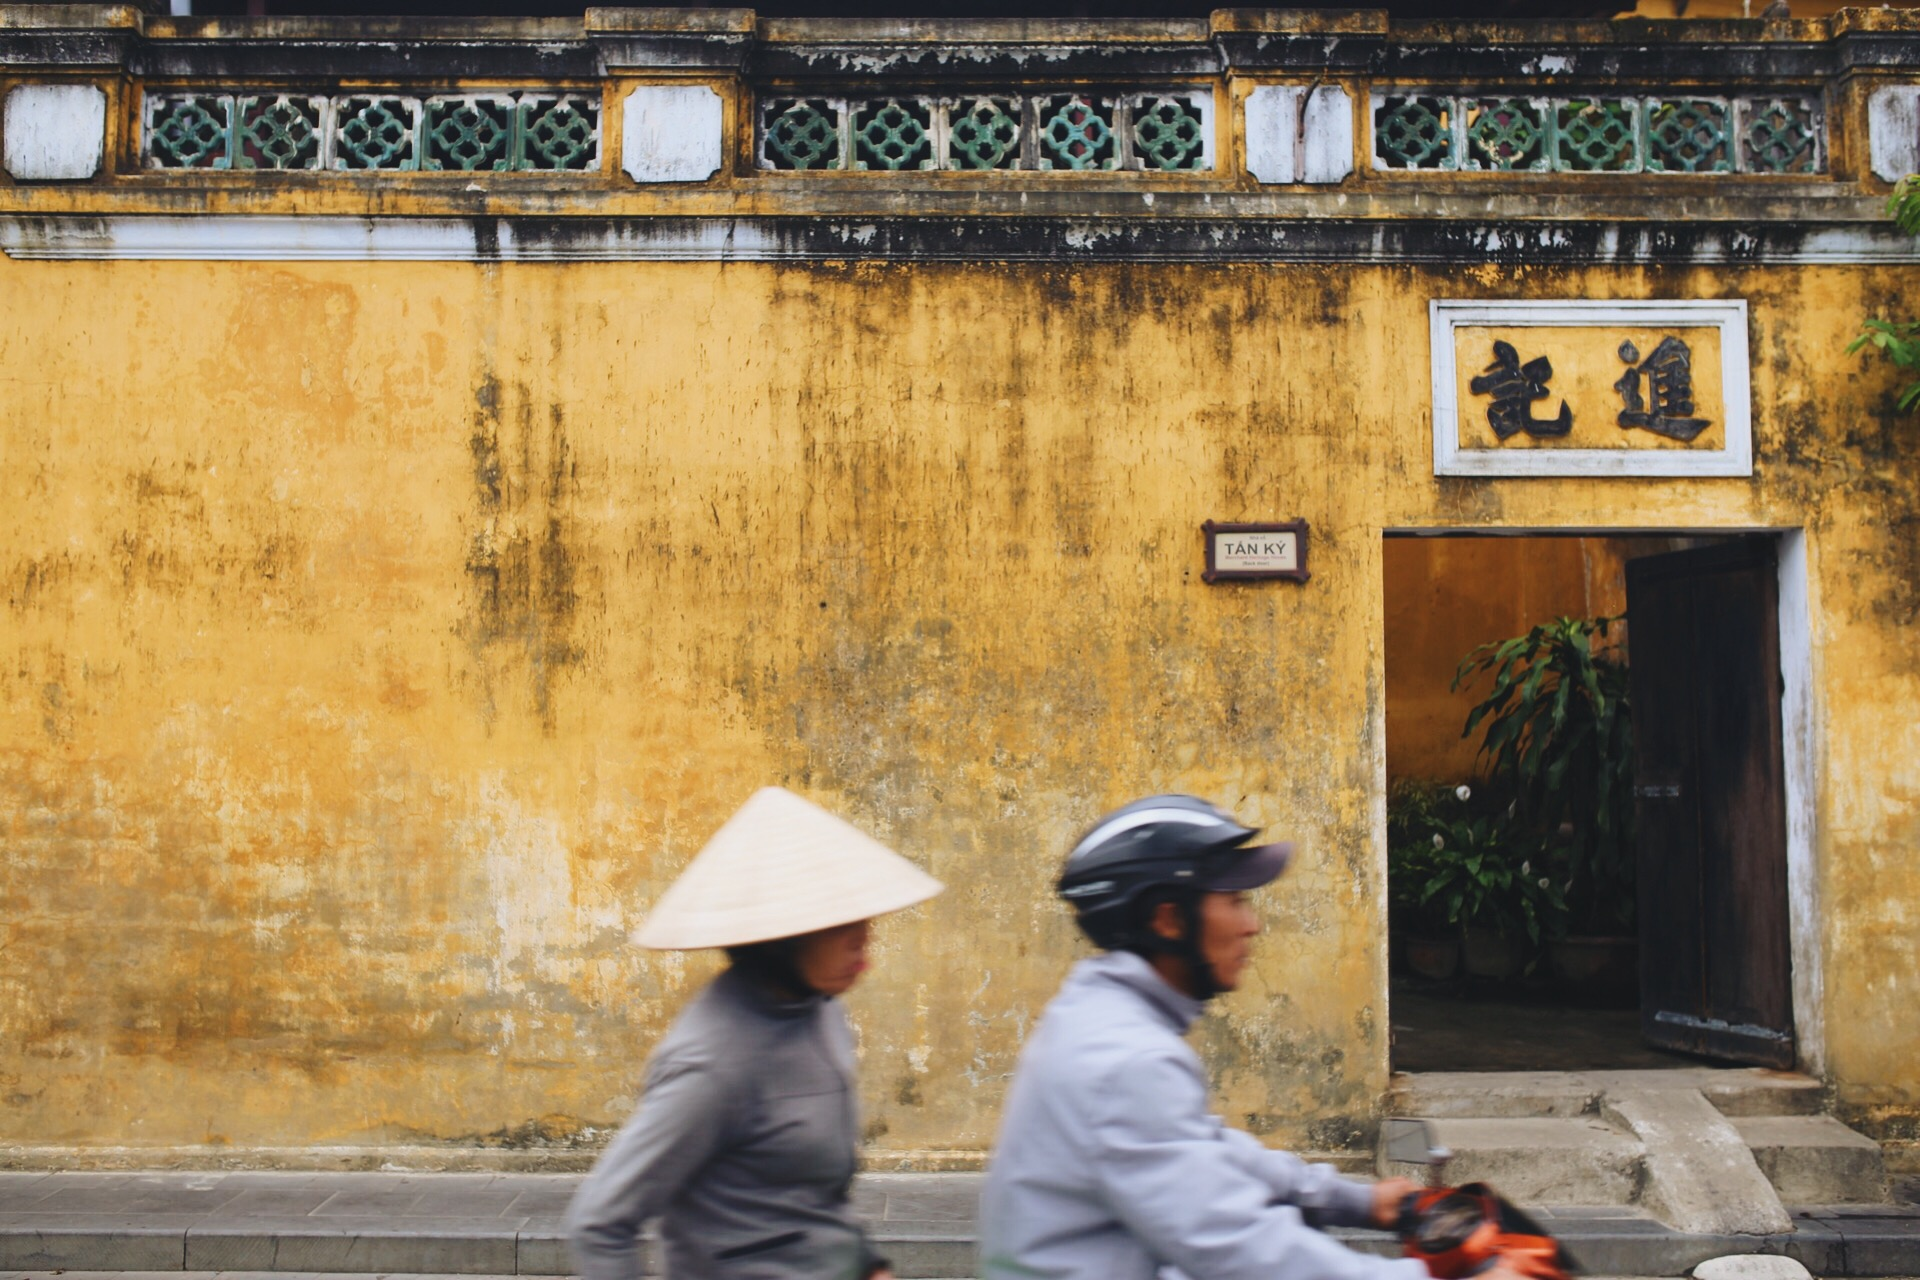 voyage-vietnam-itinéraire-blog-onmywayFR.JPG